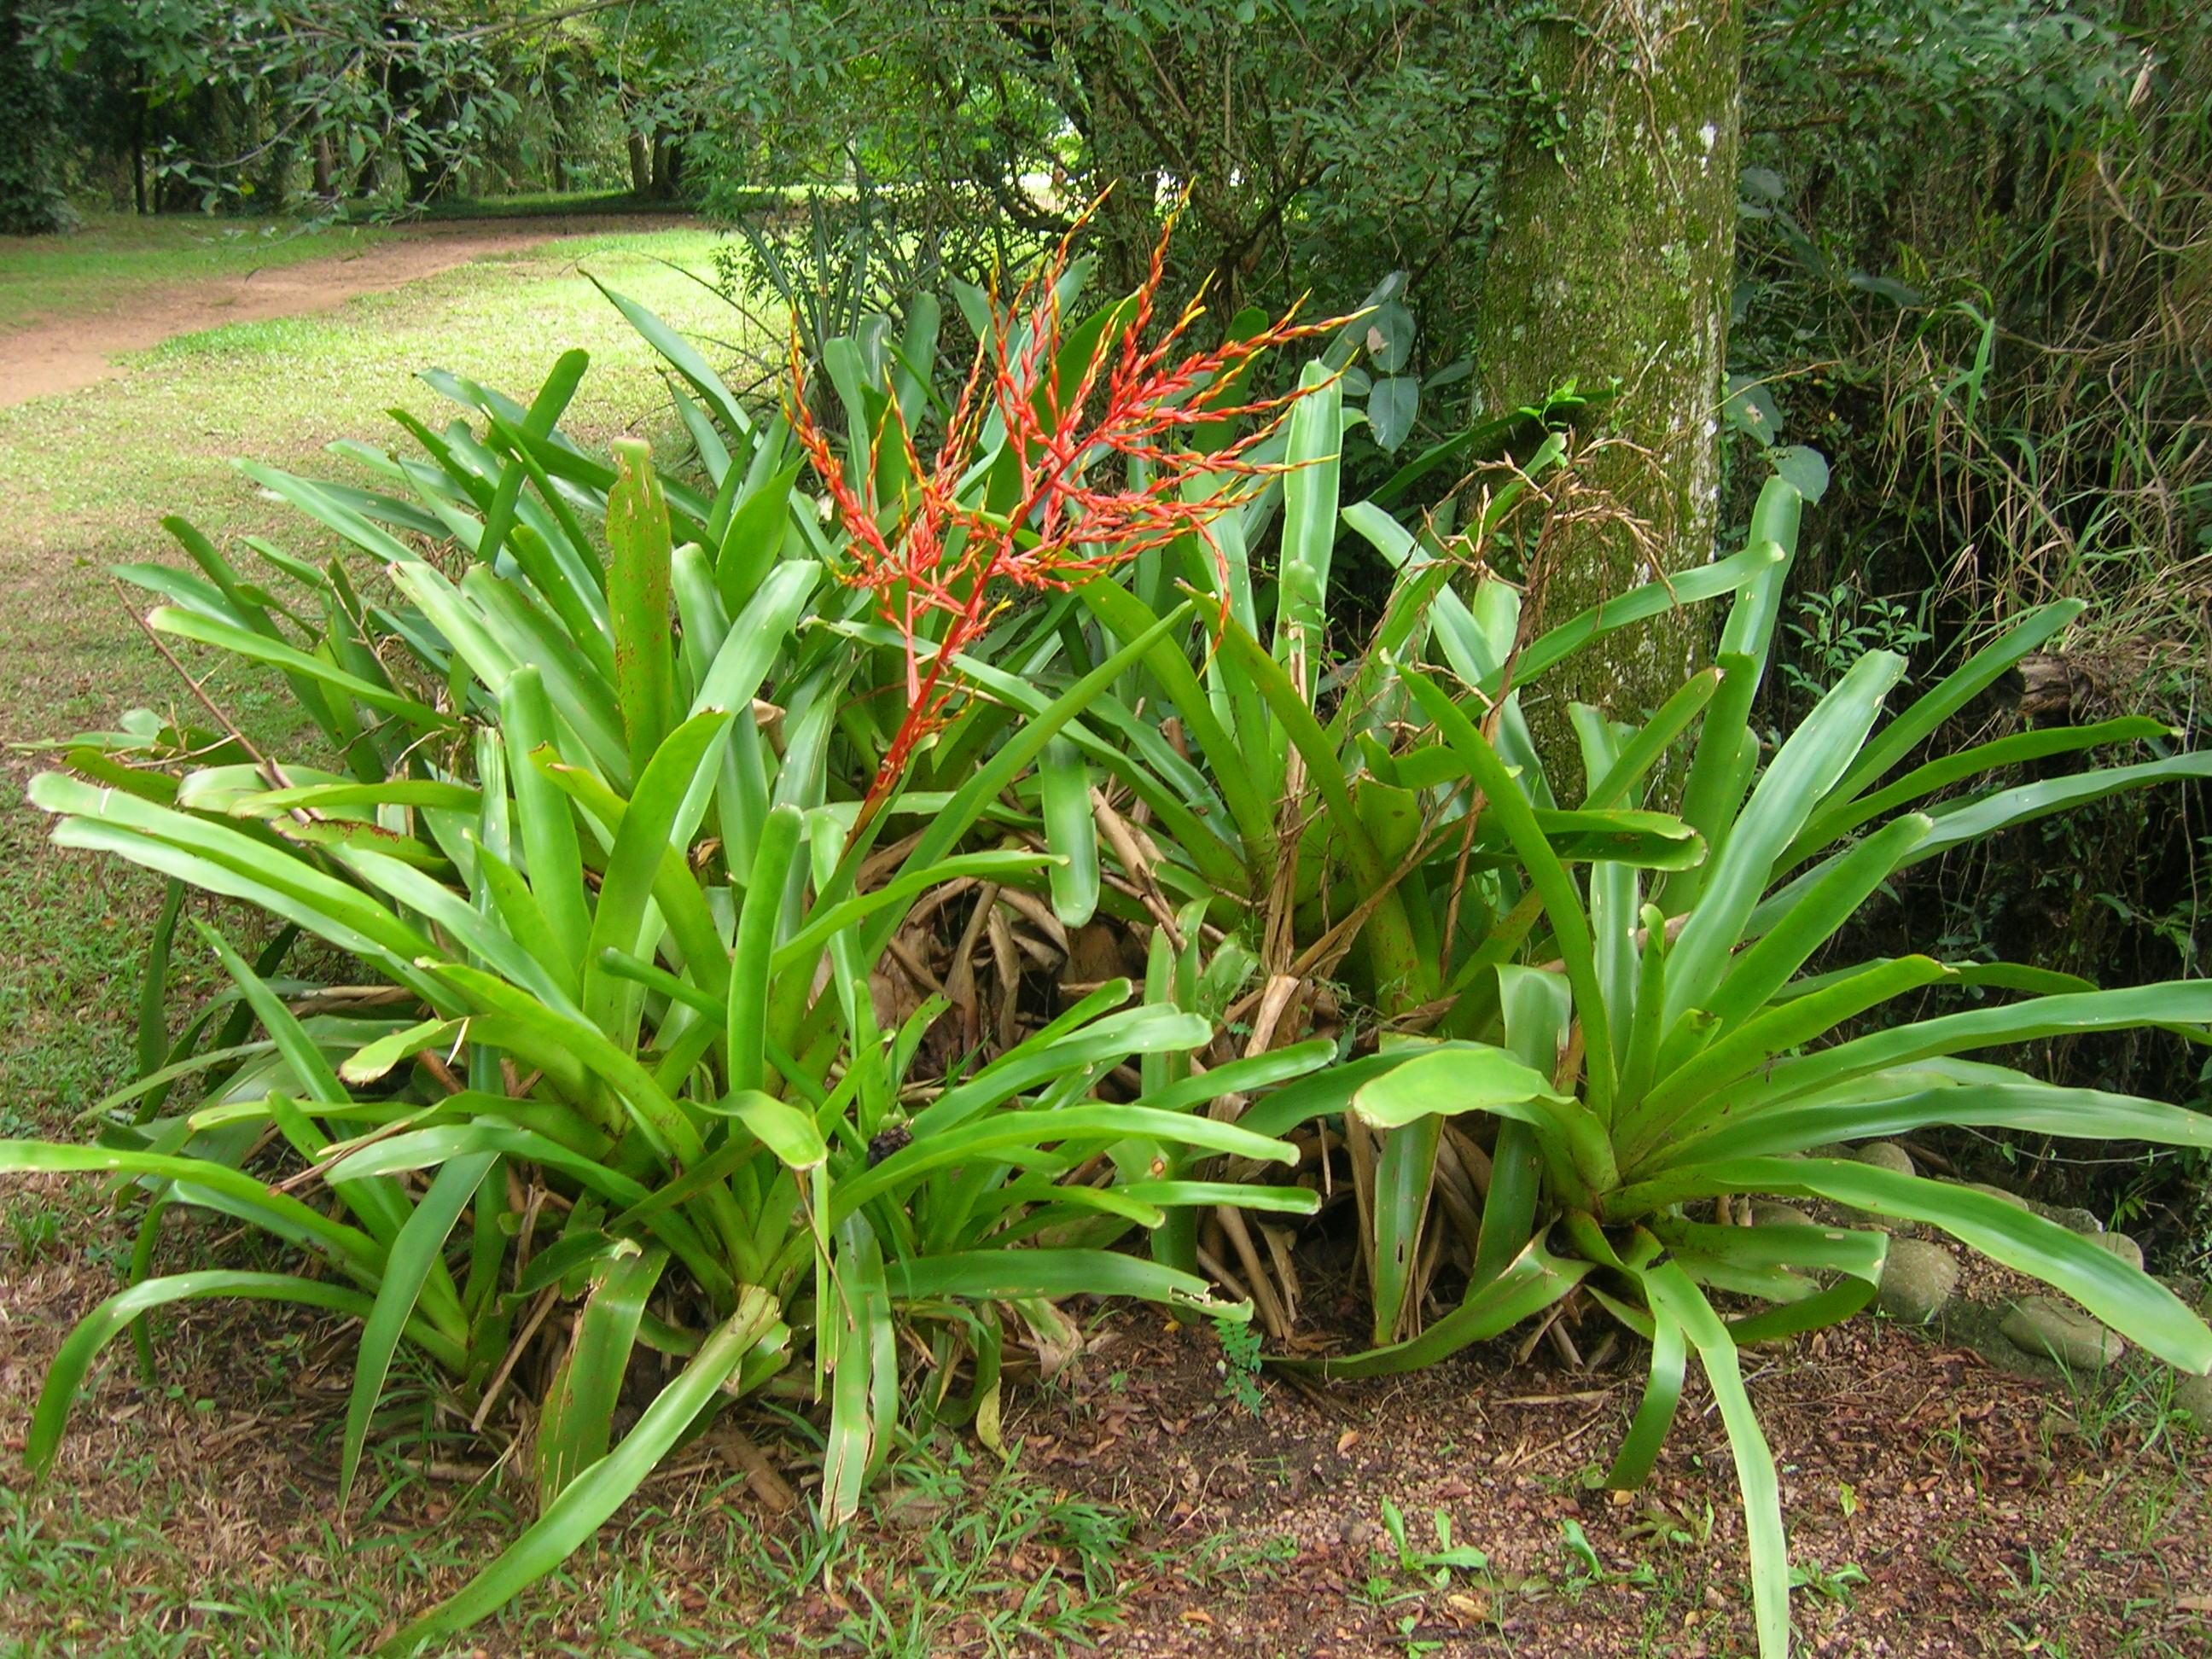 File:Planta Jardim Bot?nico Porto Alegre.JPG - Wikimedia ...